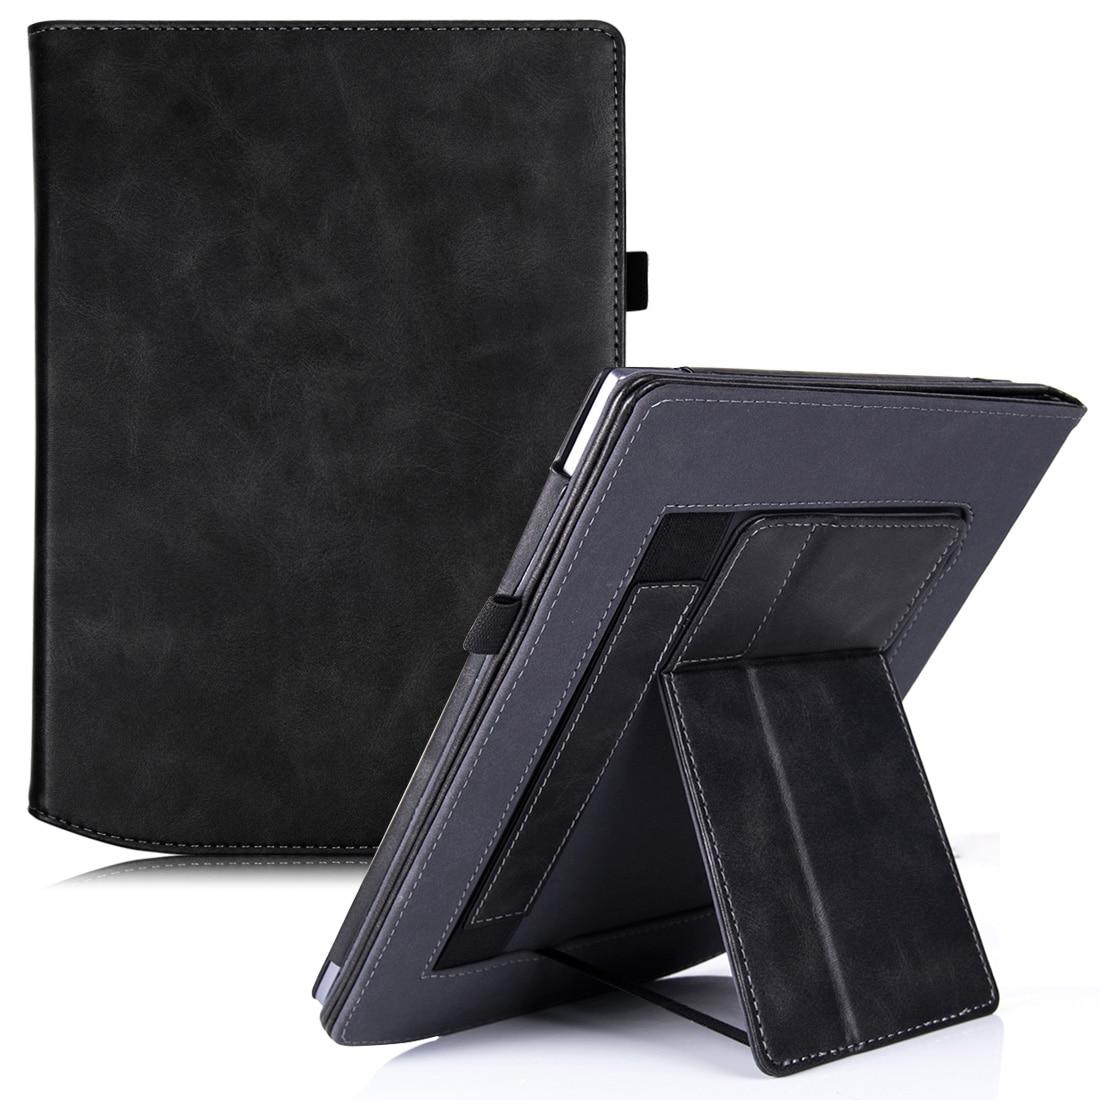 Aroita caso para pocketbook inkpad x 2020, portátil handheld suporte capa protetora com sono automático/wake caso de modo suporte duplo